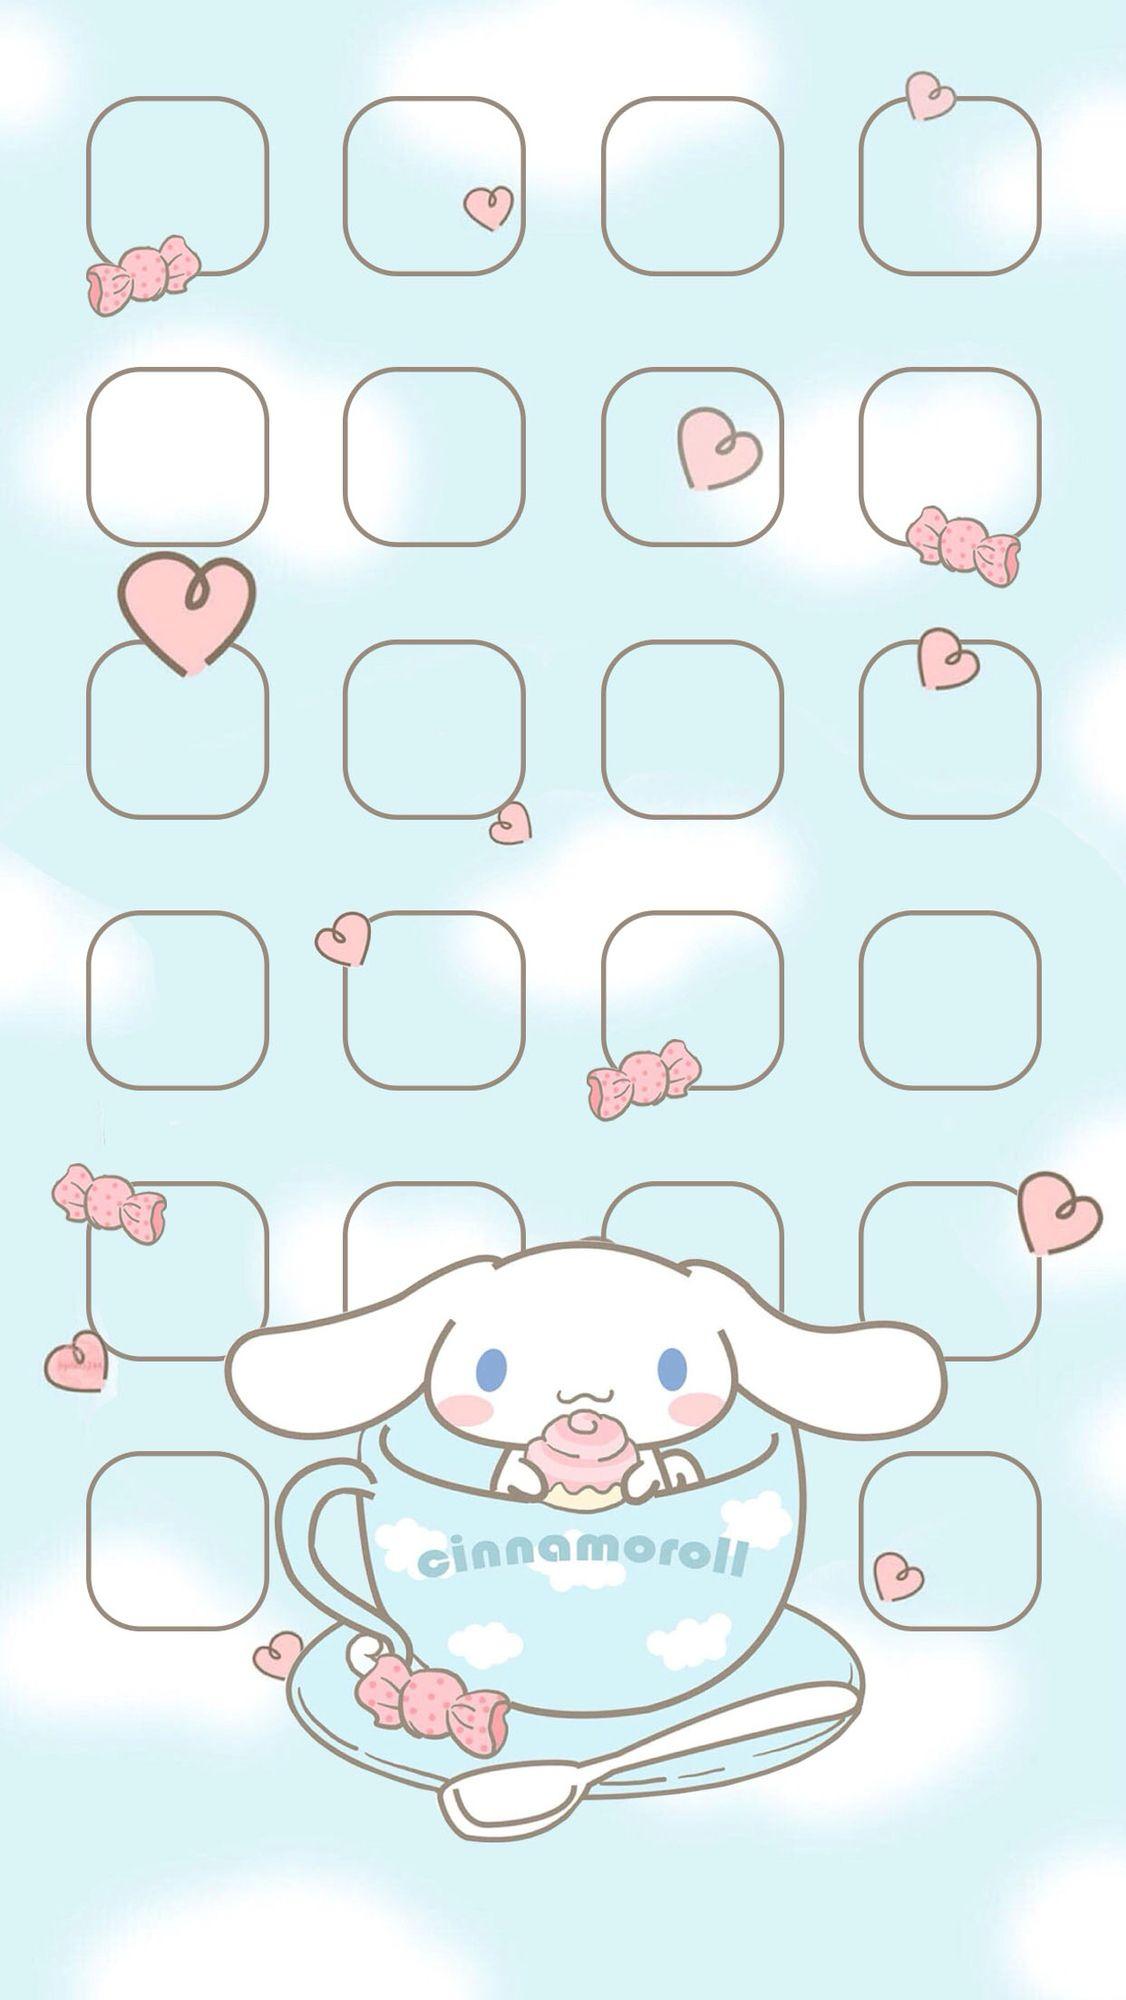 Simple Wallpaper Hello Kitty Iphone 6s Plus - 1f66ea2b0aa8a7b2694474a60c684964  Trends_59937.jpg